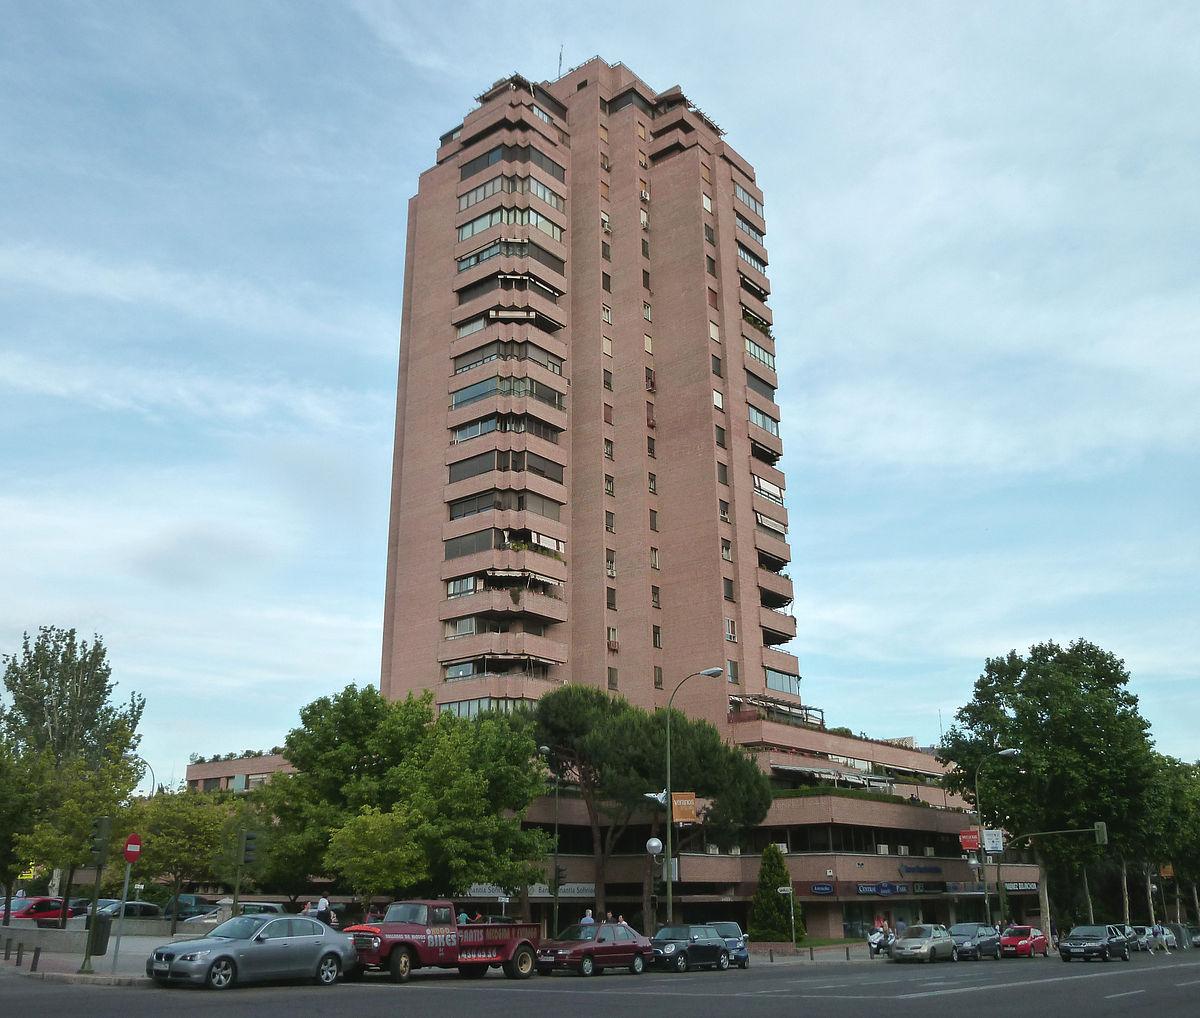 Torre del retiro wikipedia la enciclopedia libre for Oficinas pelayo